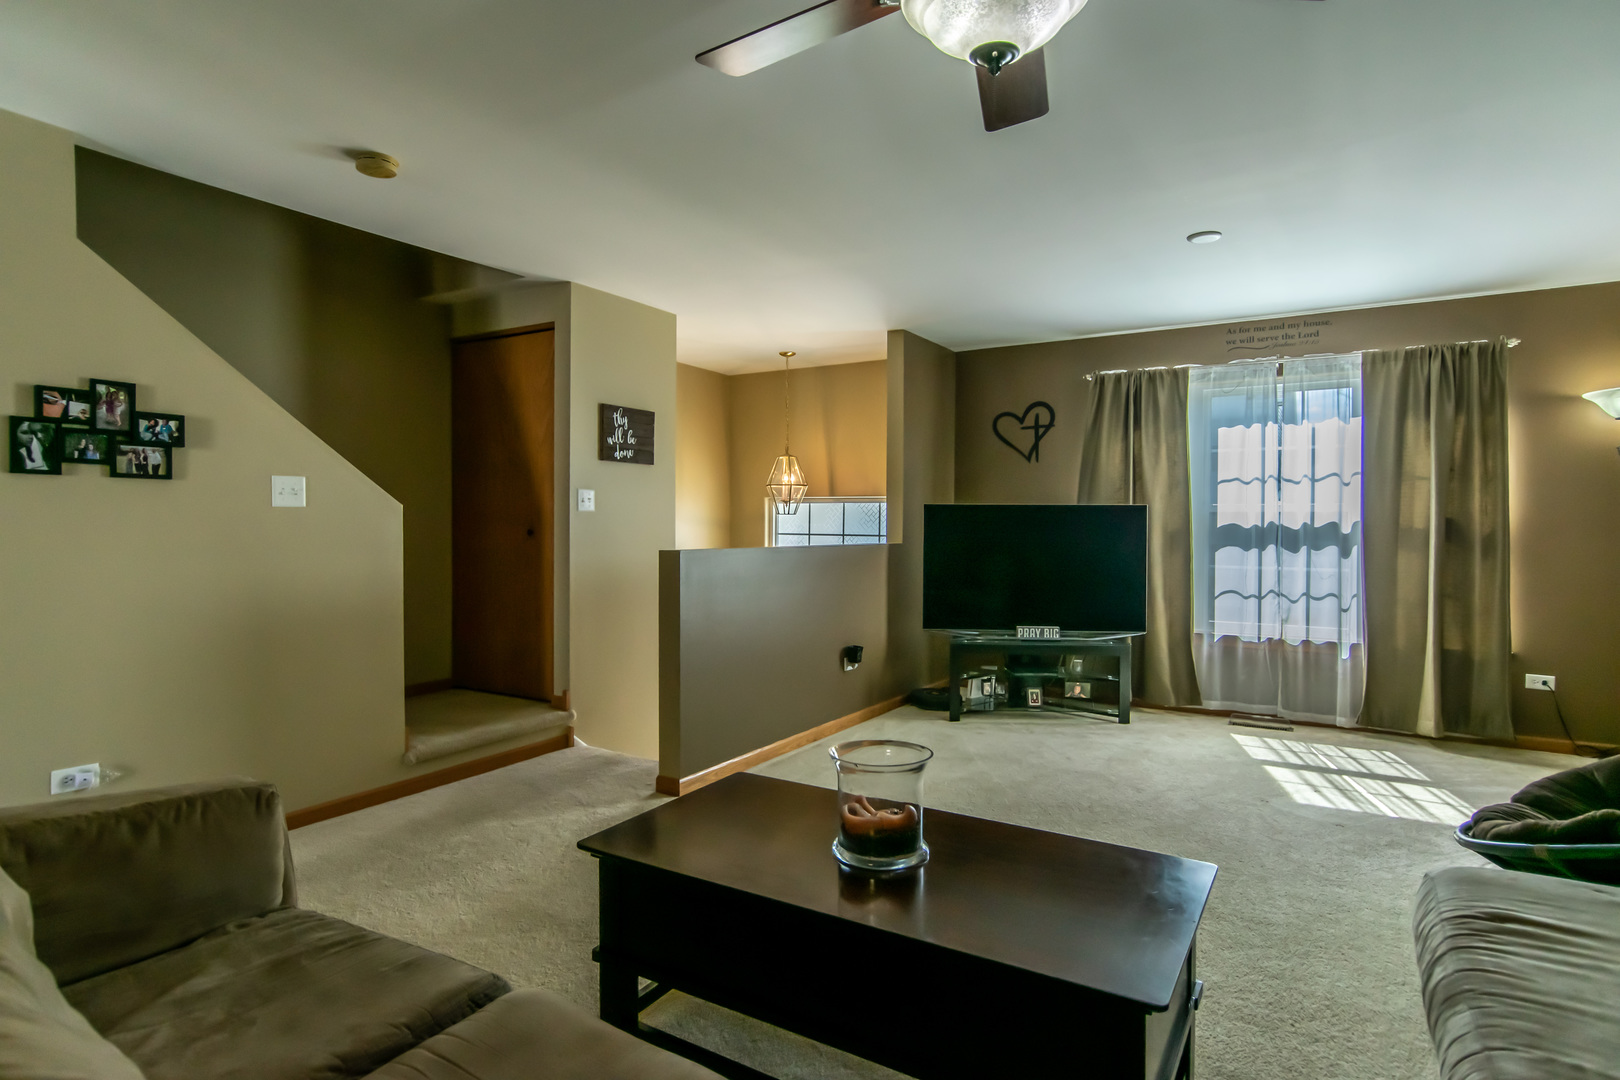 3472 MEADOW LILY, Joliet, Illinois, 60431